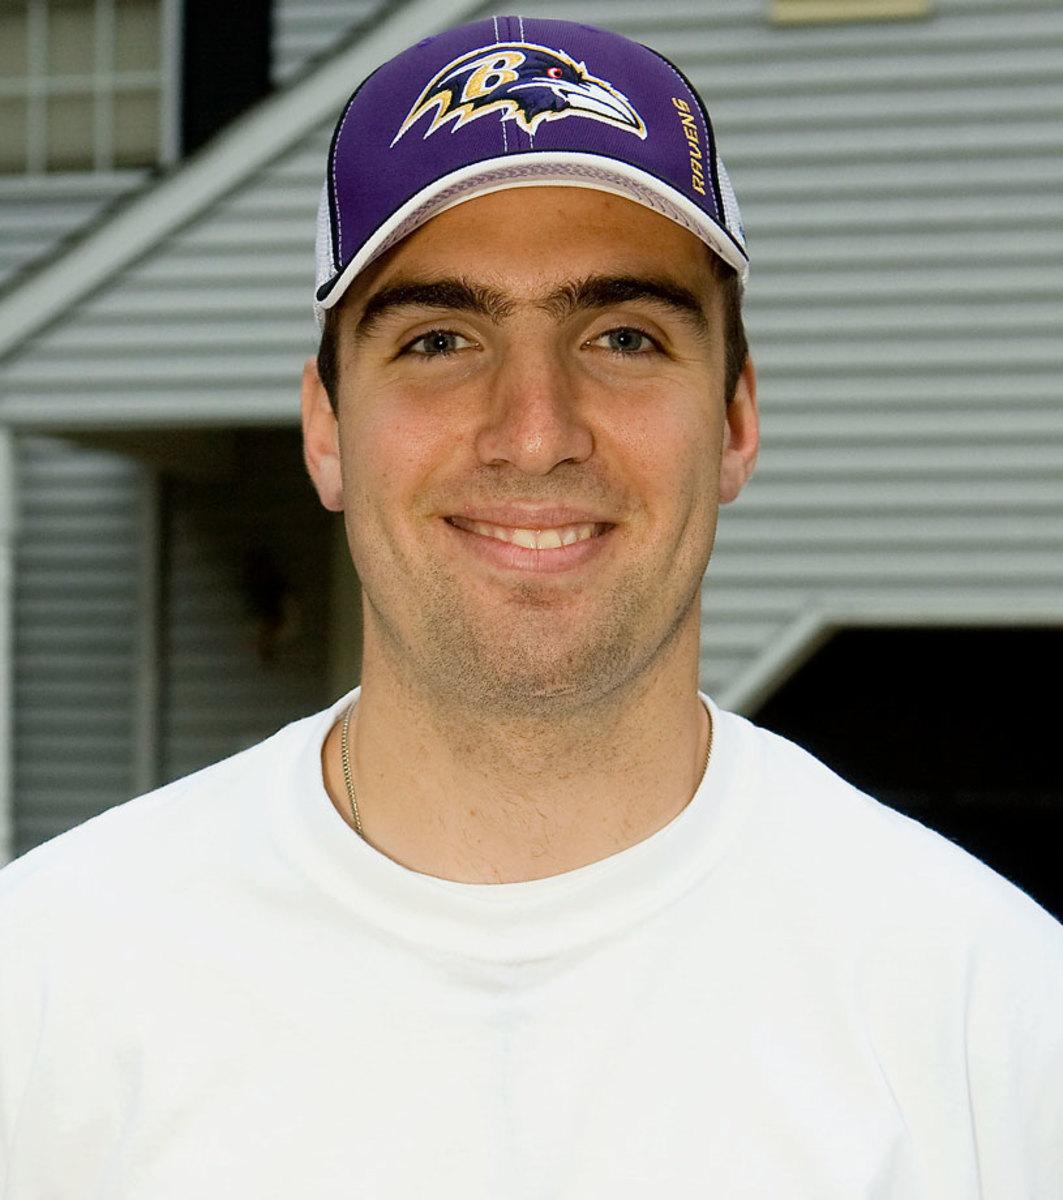 Joe-Flacco-unibrow.jpg